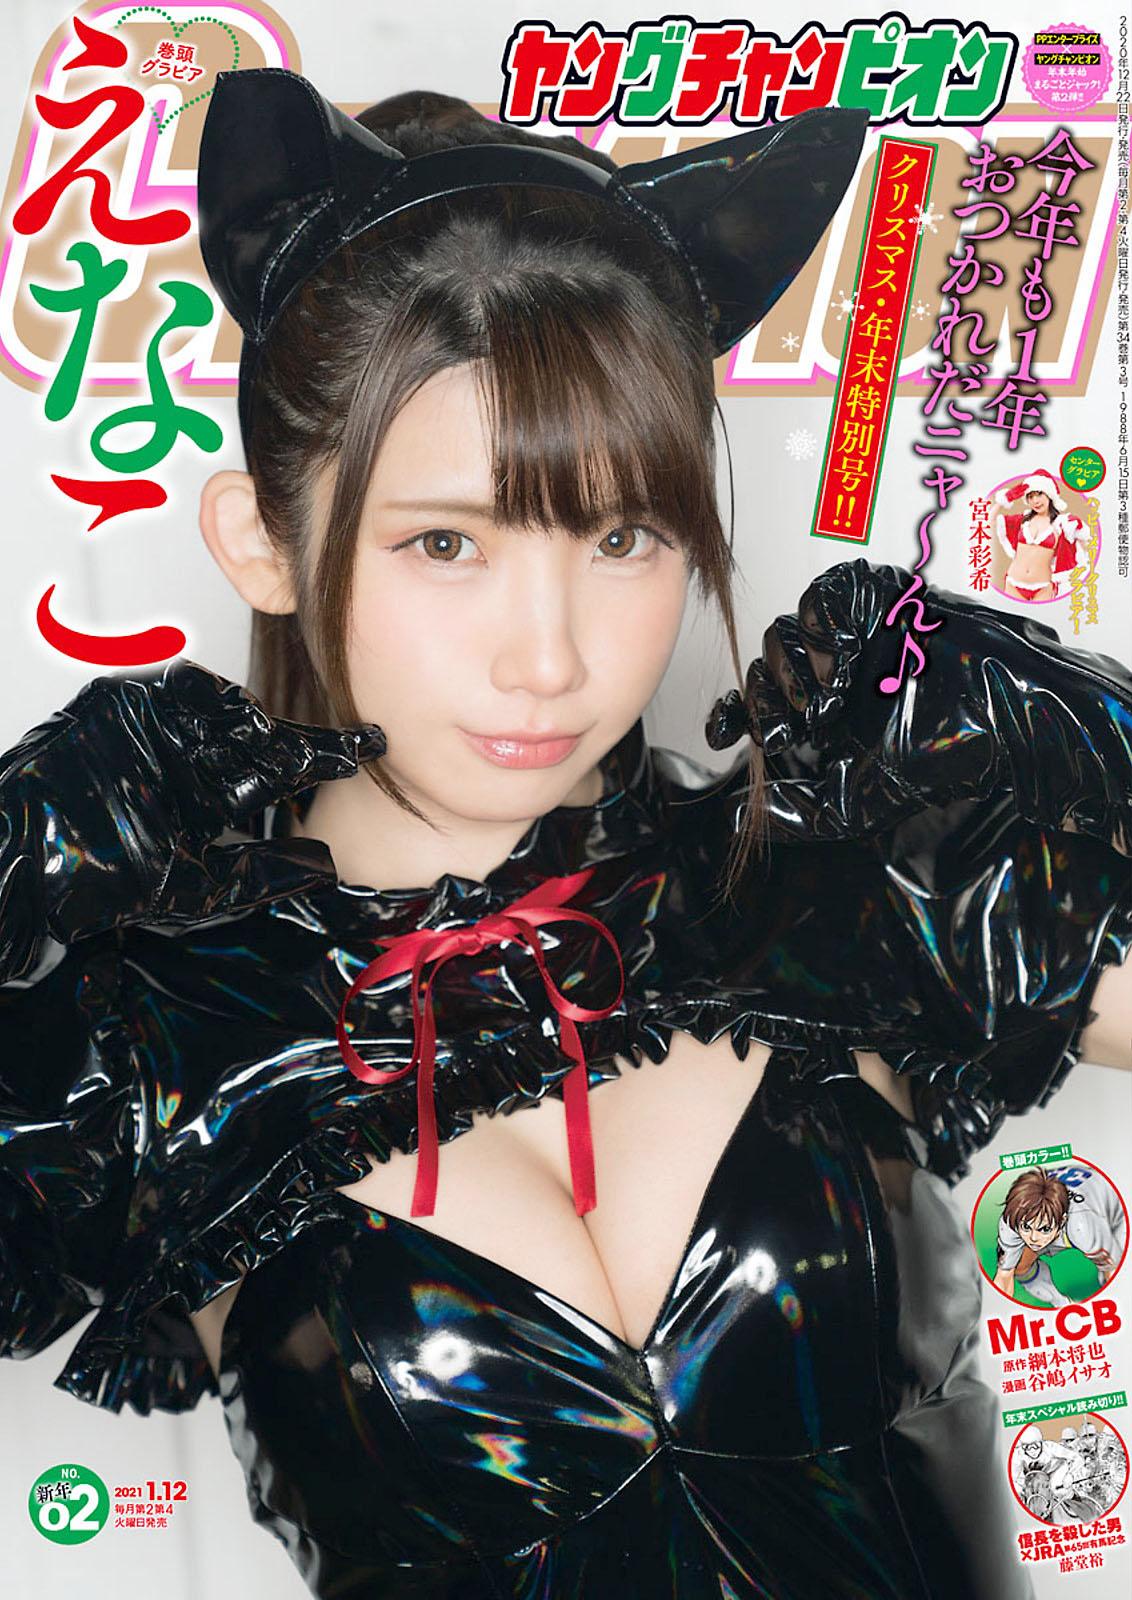 Enako Young Champion 210112 01.jpg